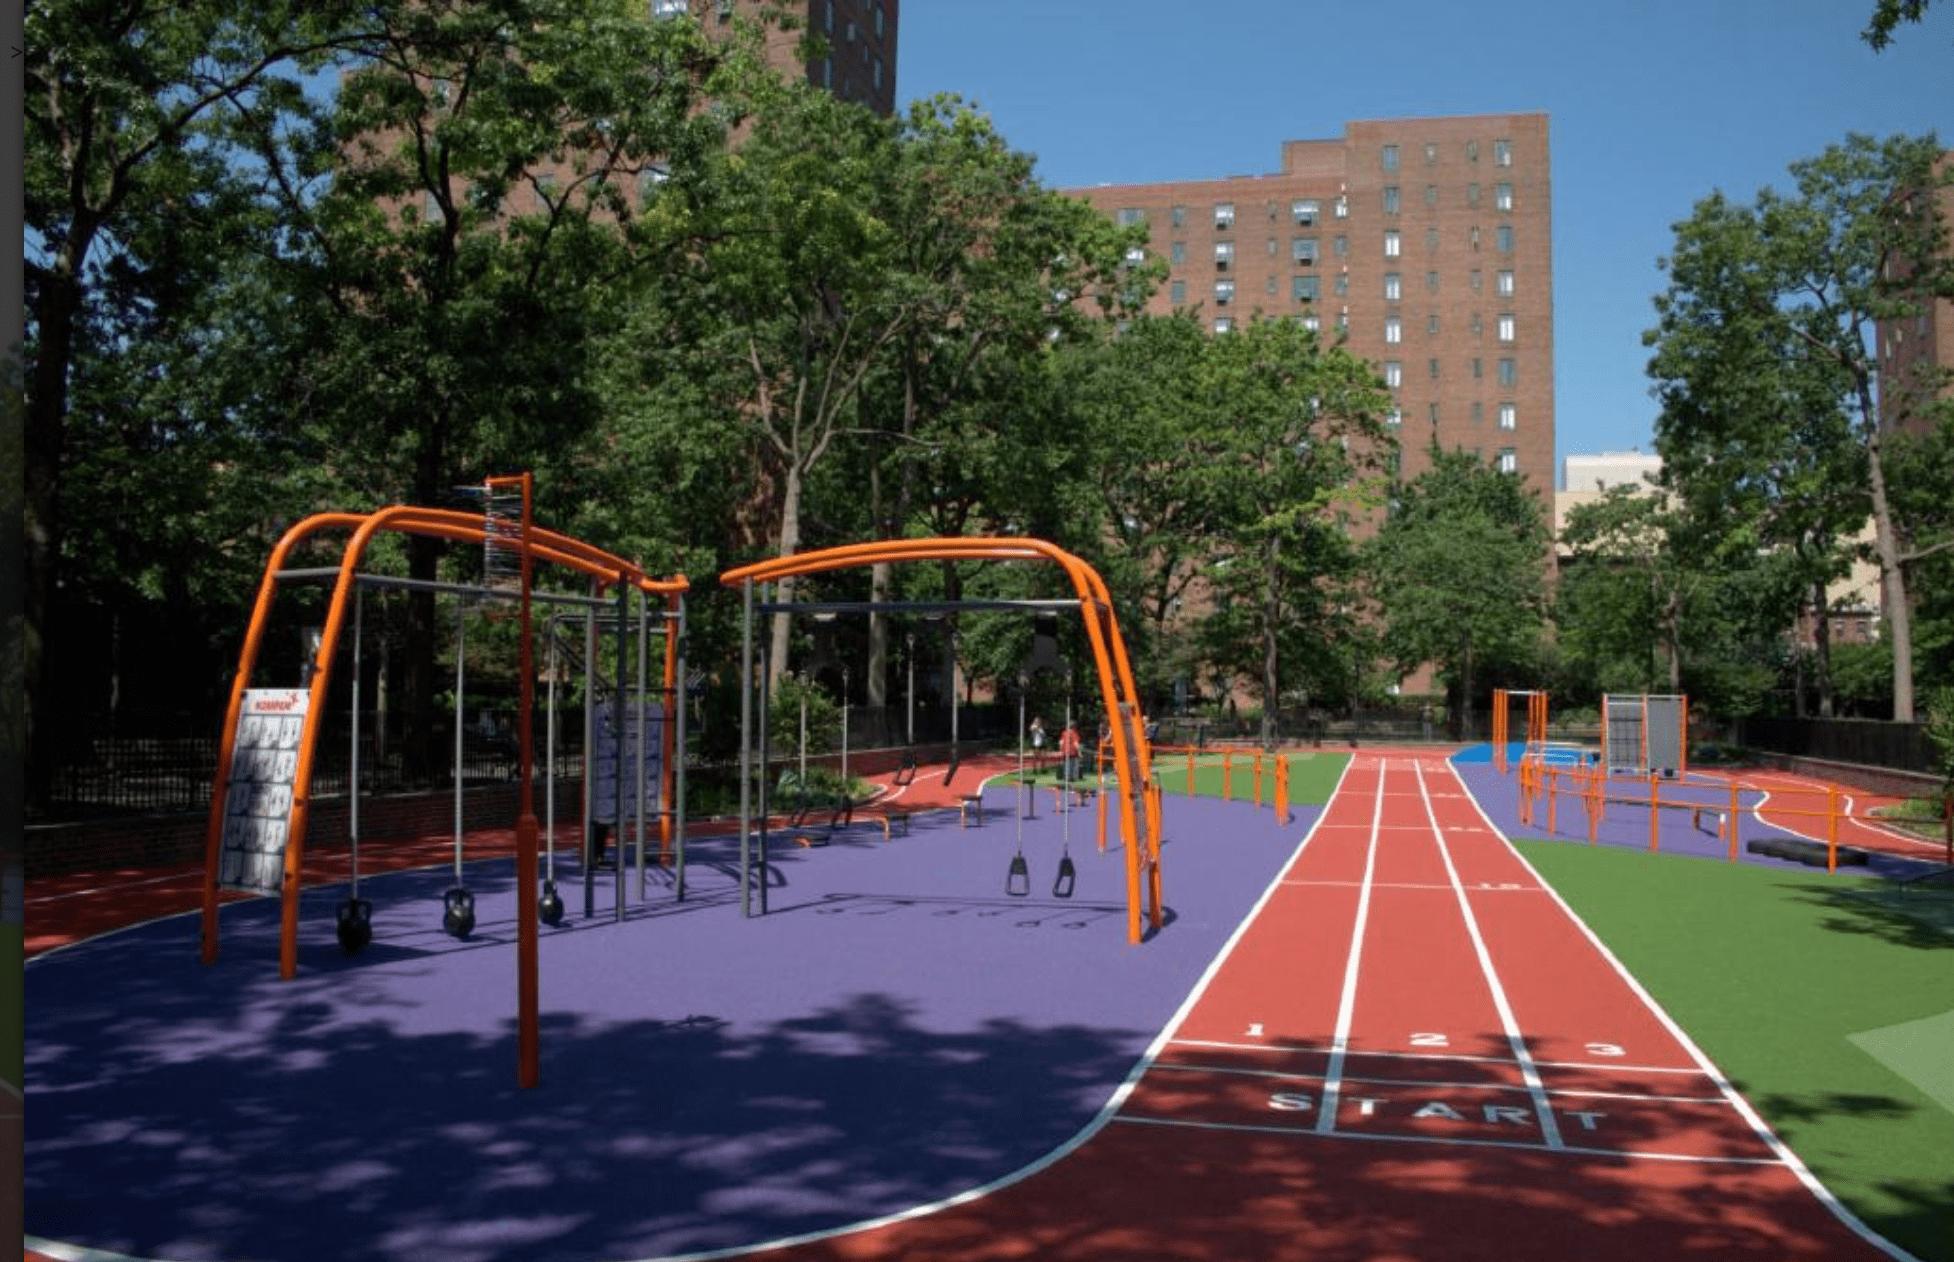 KOMPAN Adult Playgrounds